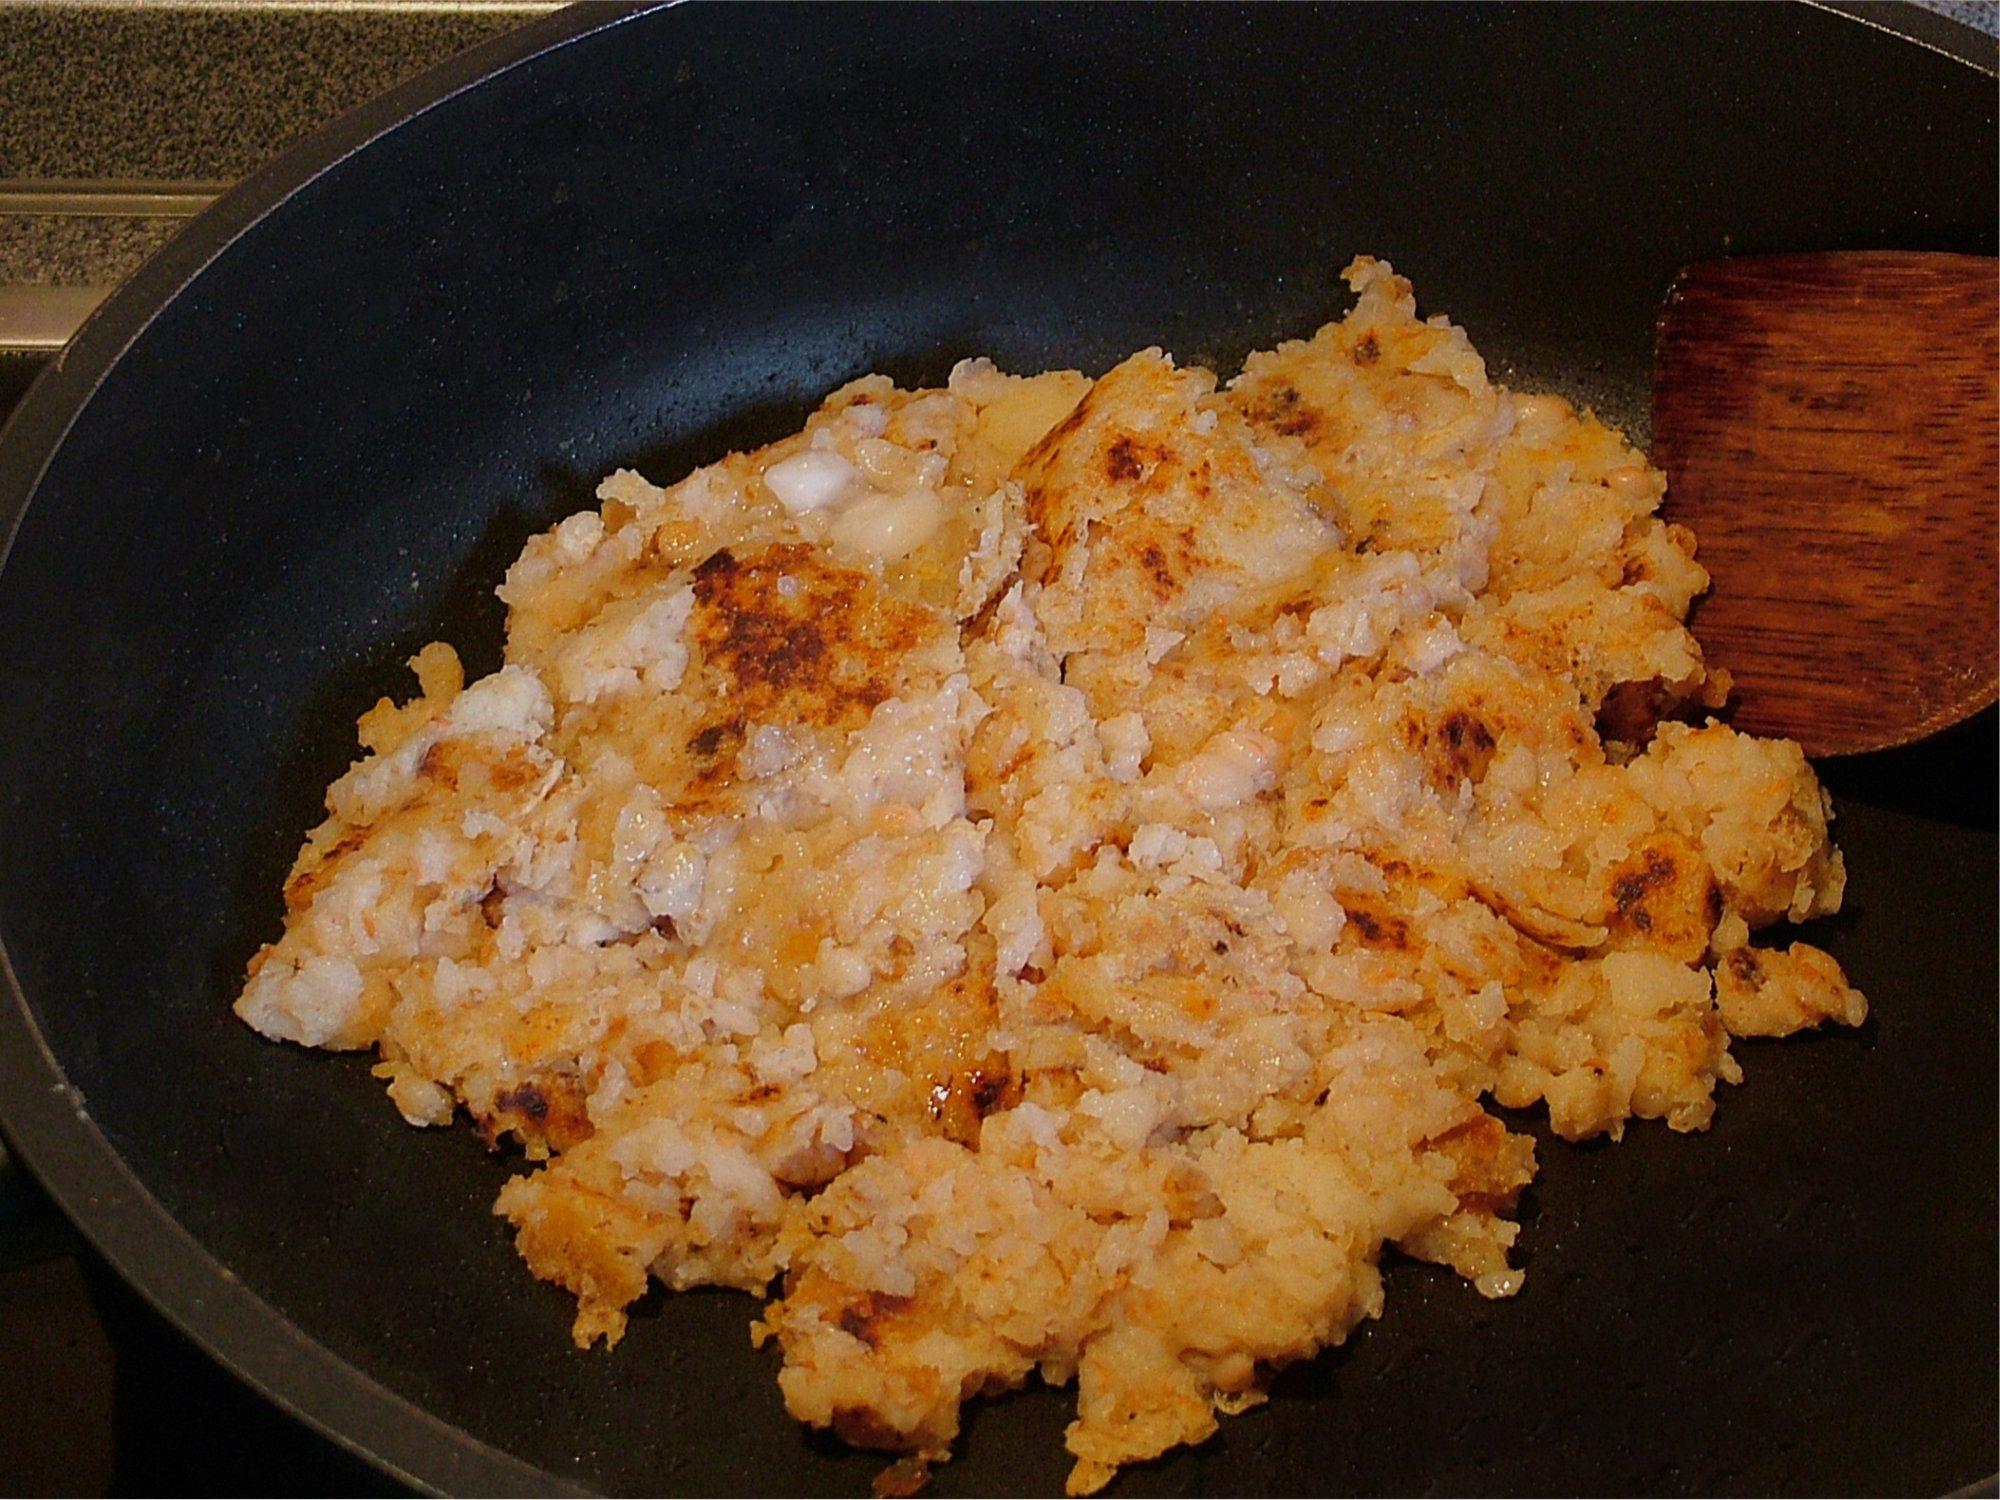 Fazuľová kaša dolnostredská s ryžou